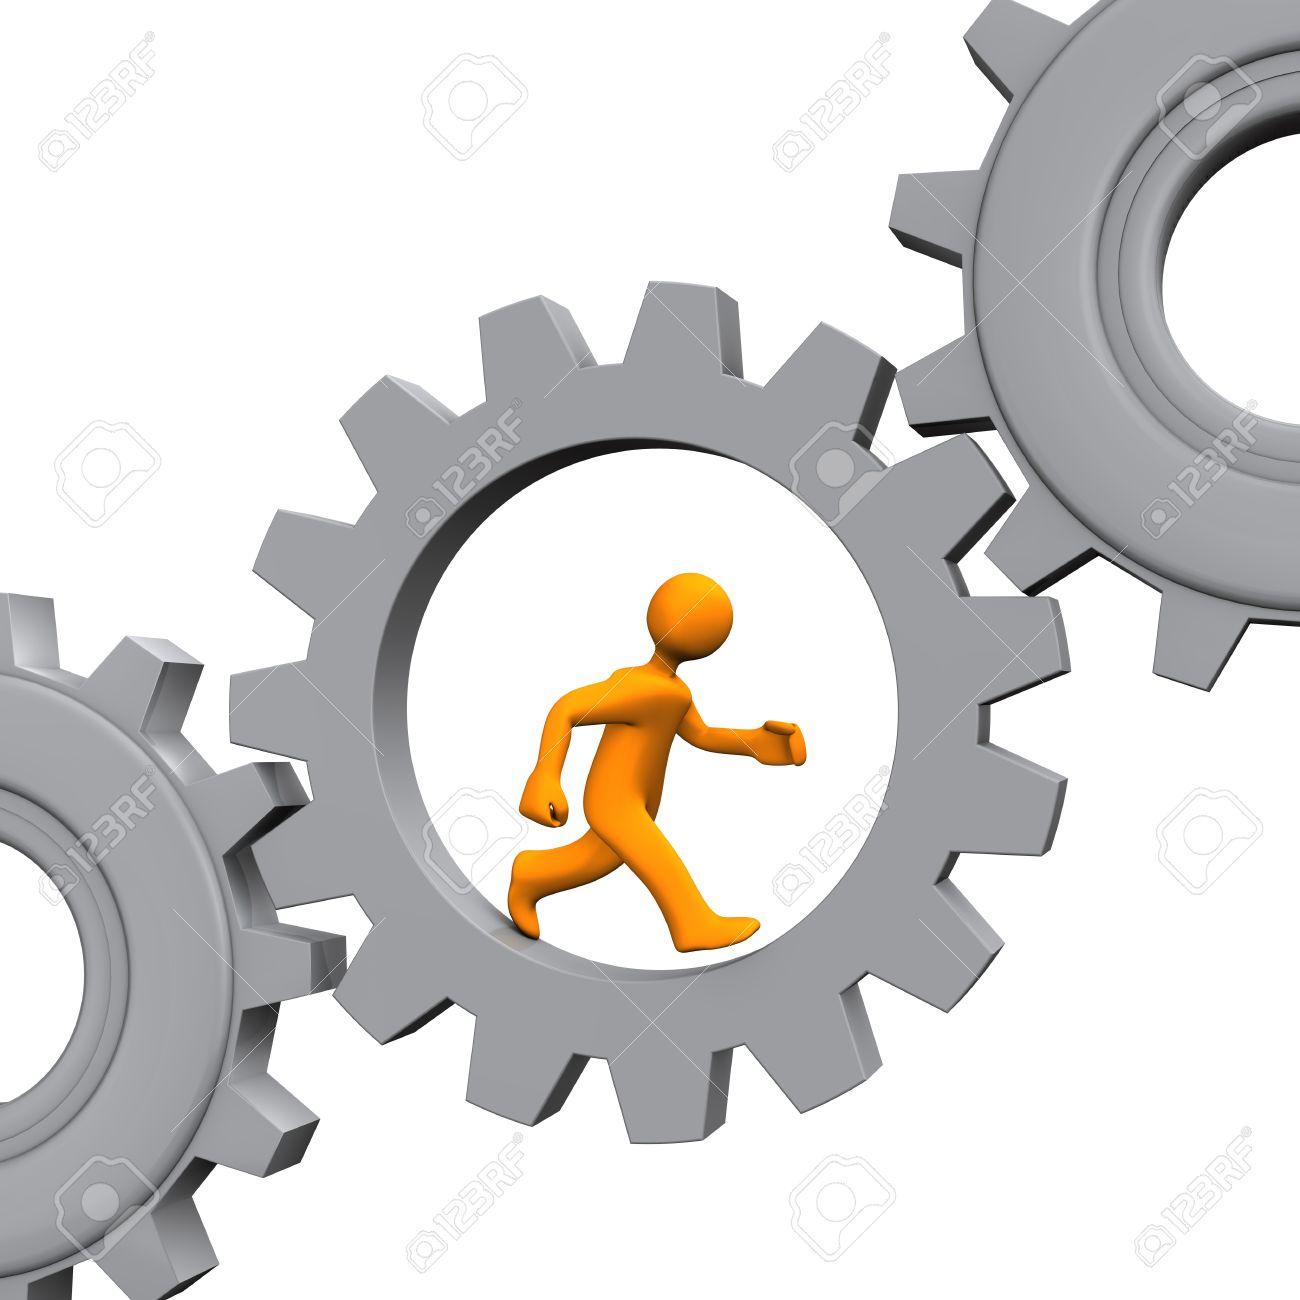 Orange cartoon character runs in the grey gear. White background. Stock Photo - 18370204